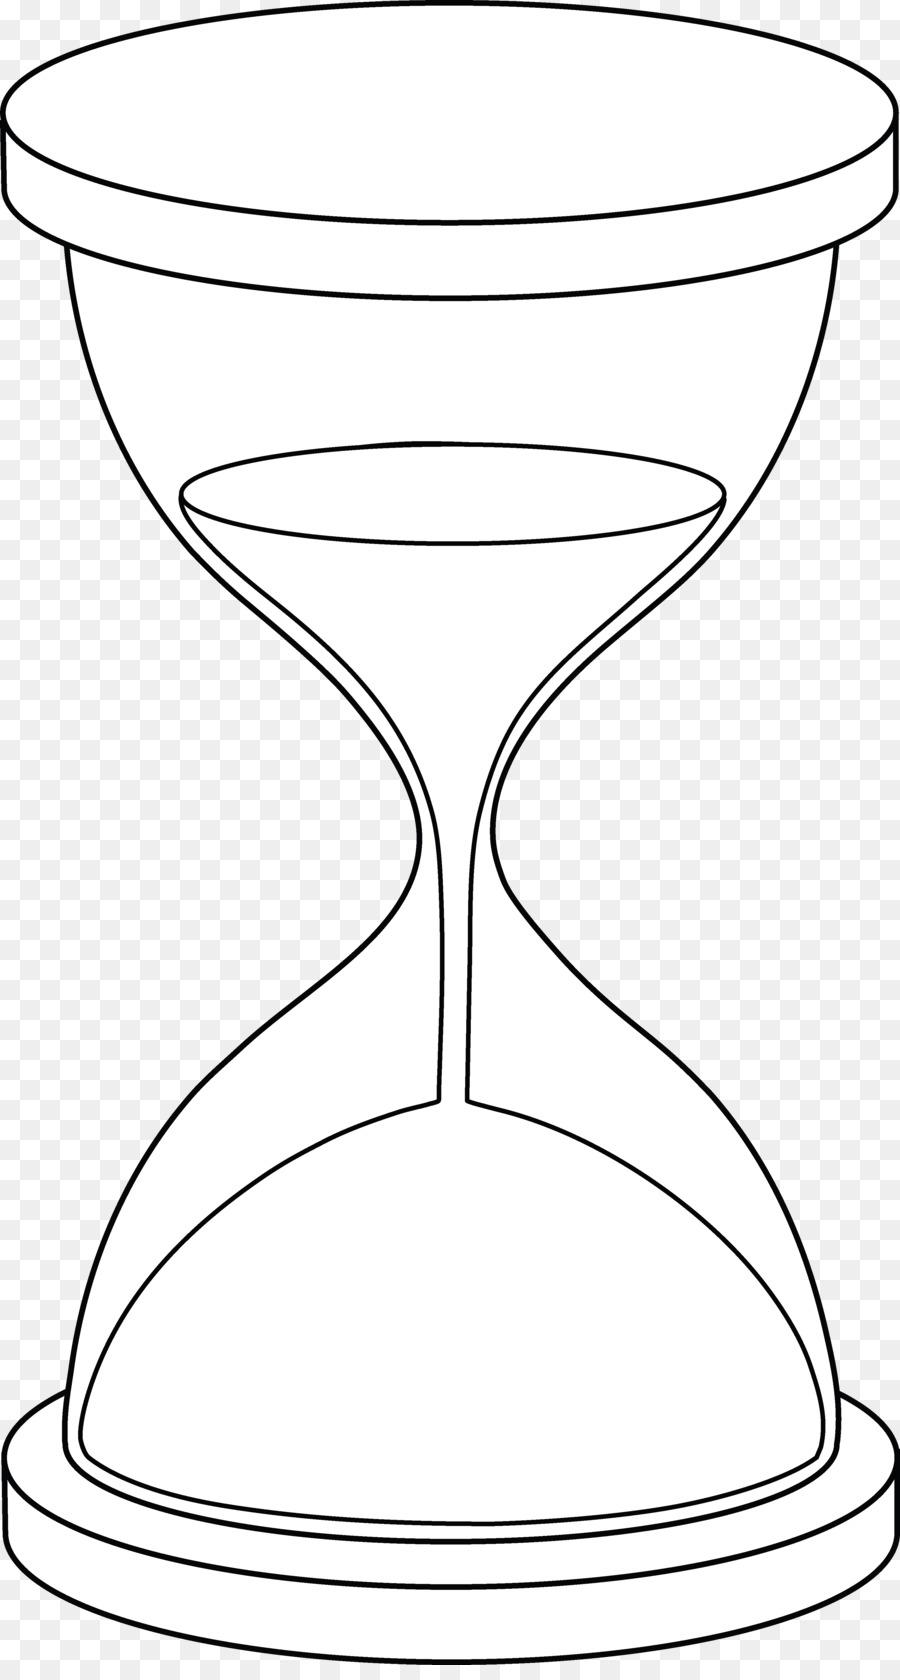 Reloj De Arena Libro Para Colorear Dibujo Imagen Png Imagen